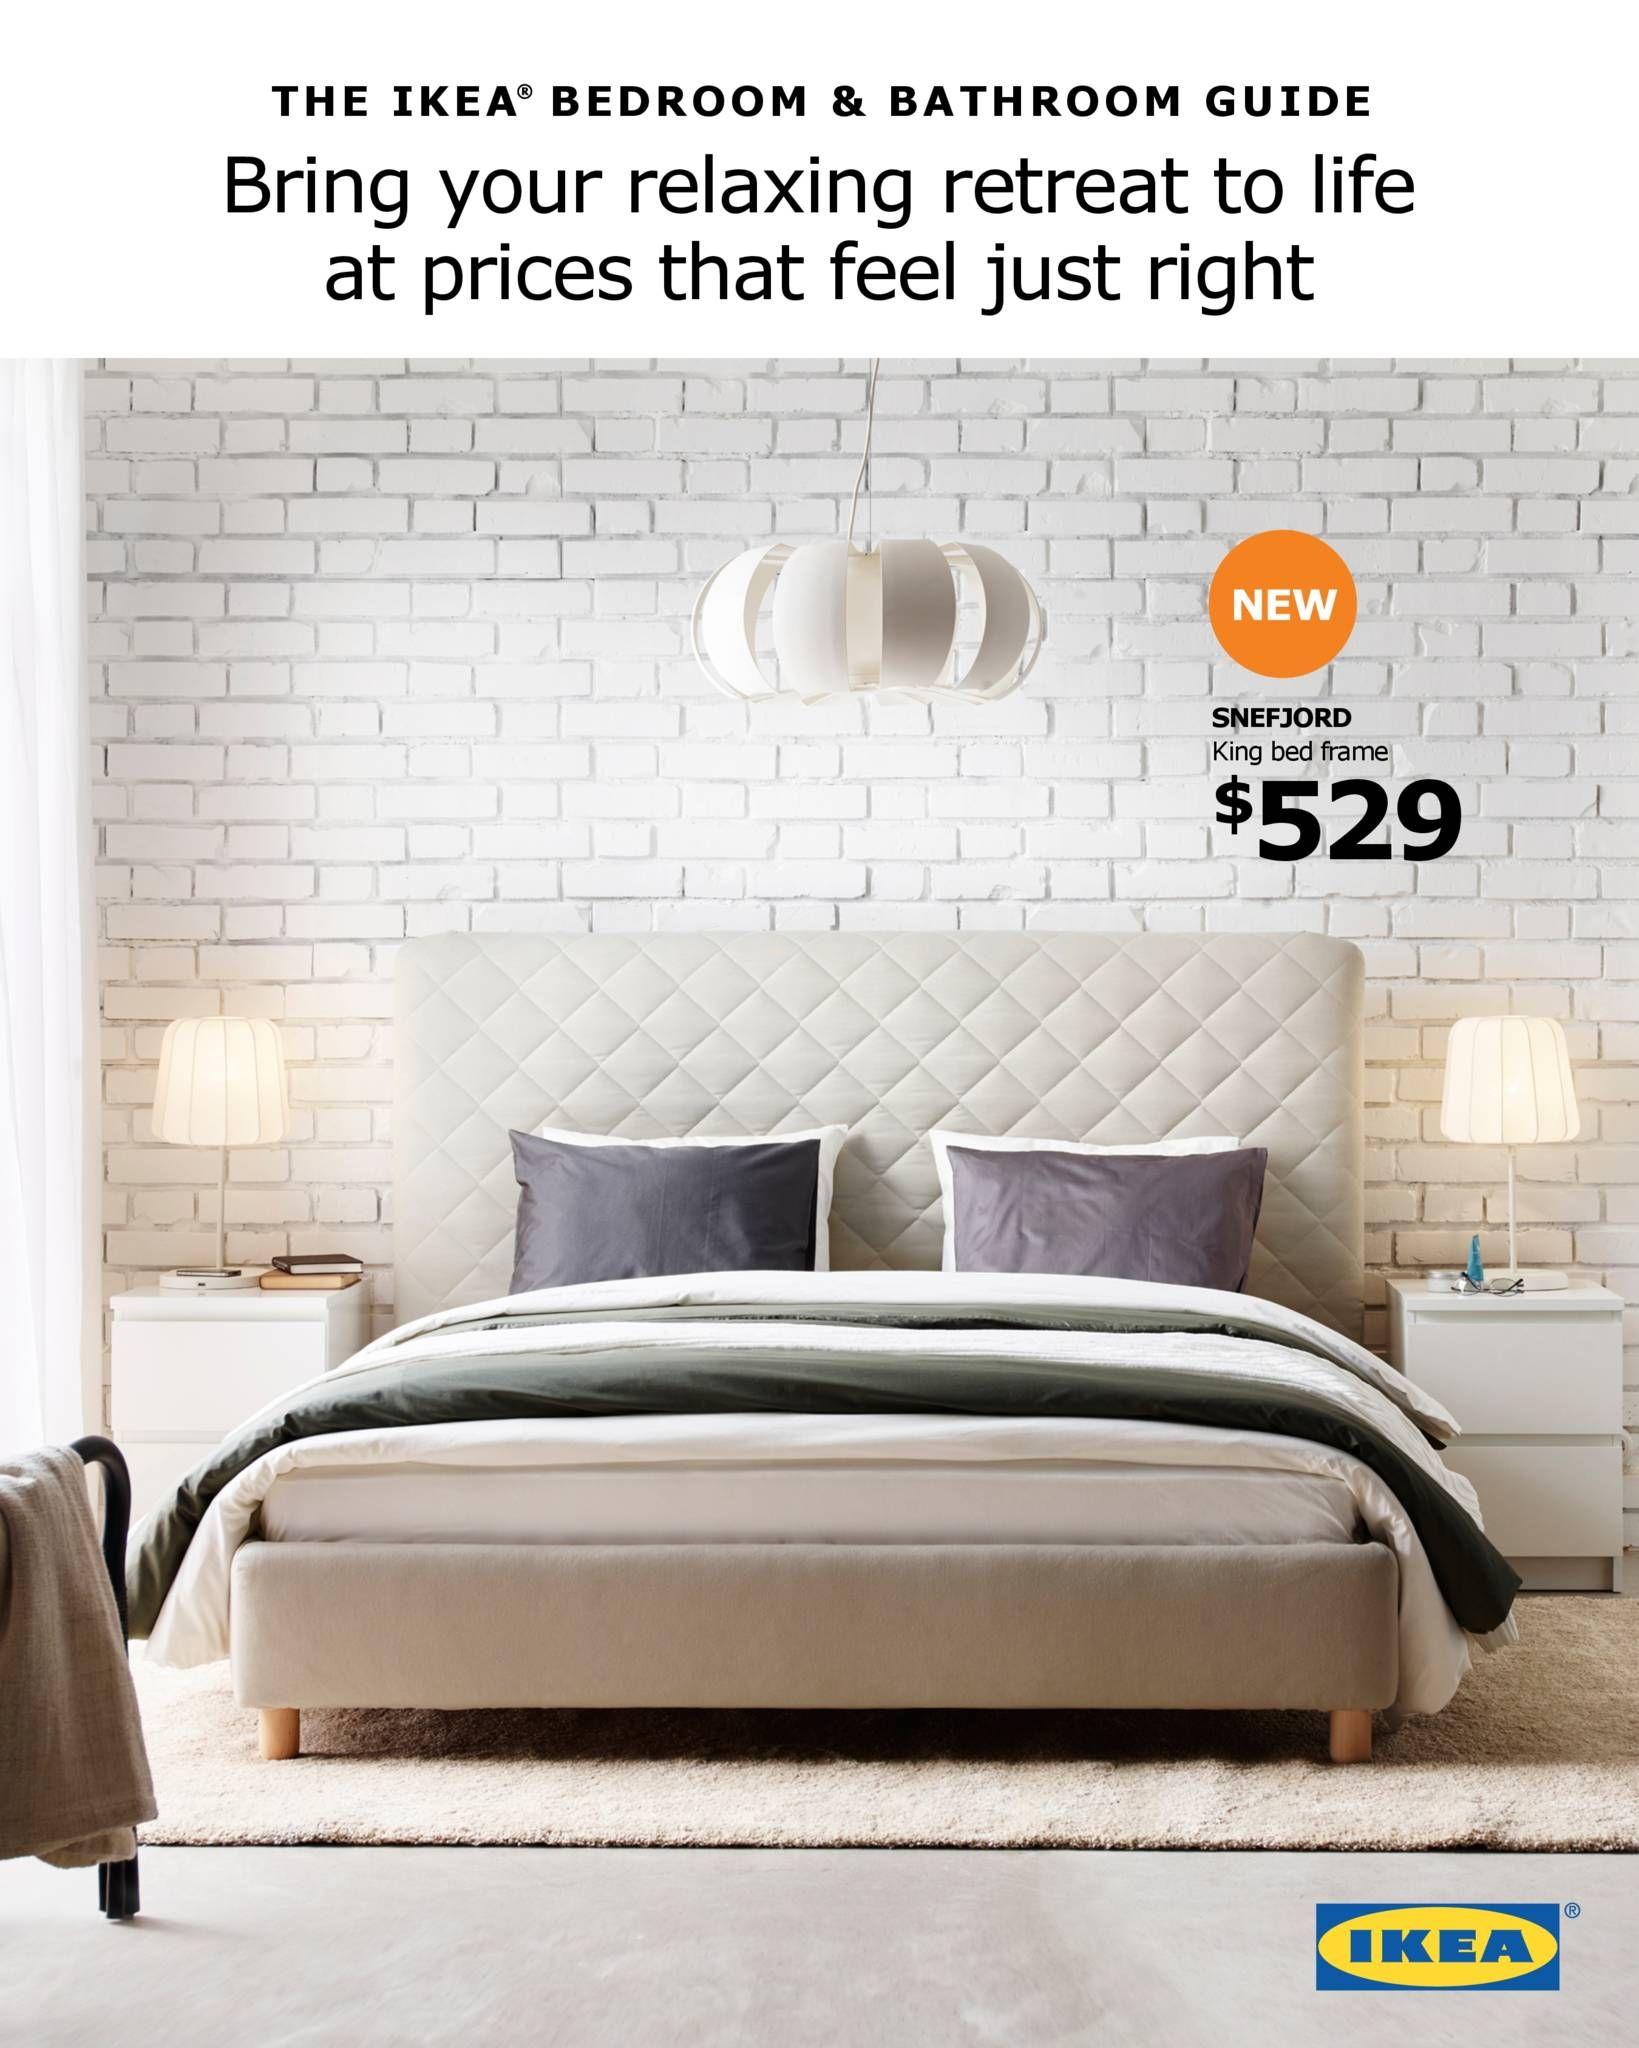 Wellbeing Guide Ikea Bedroom Bedroom Decor On A Budget Bedroom